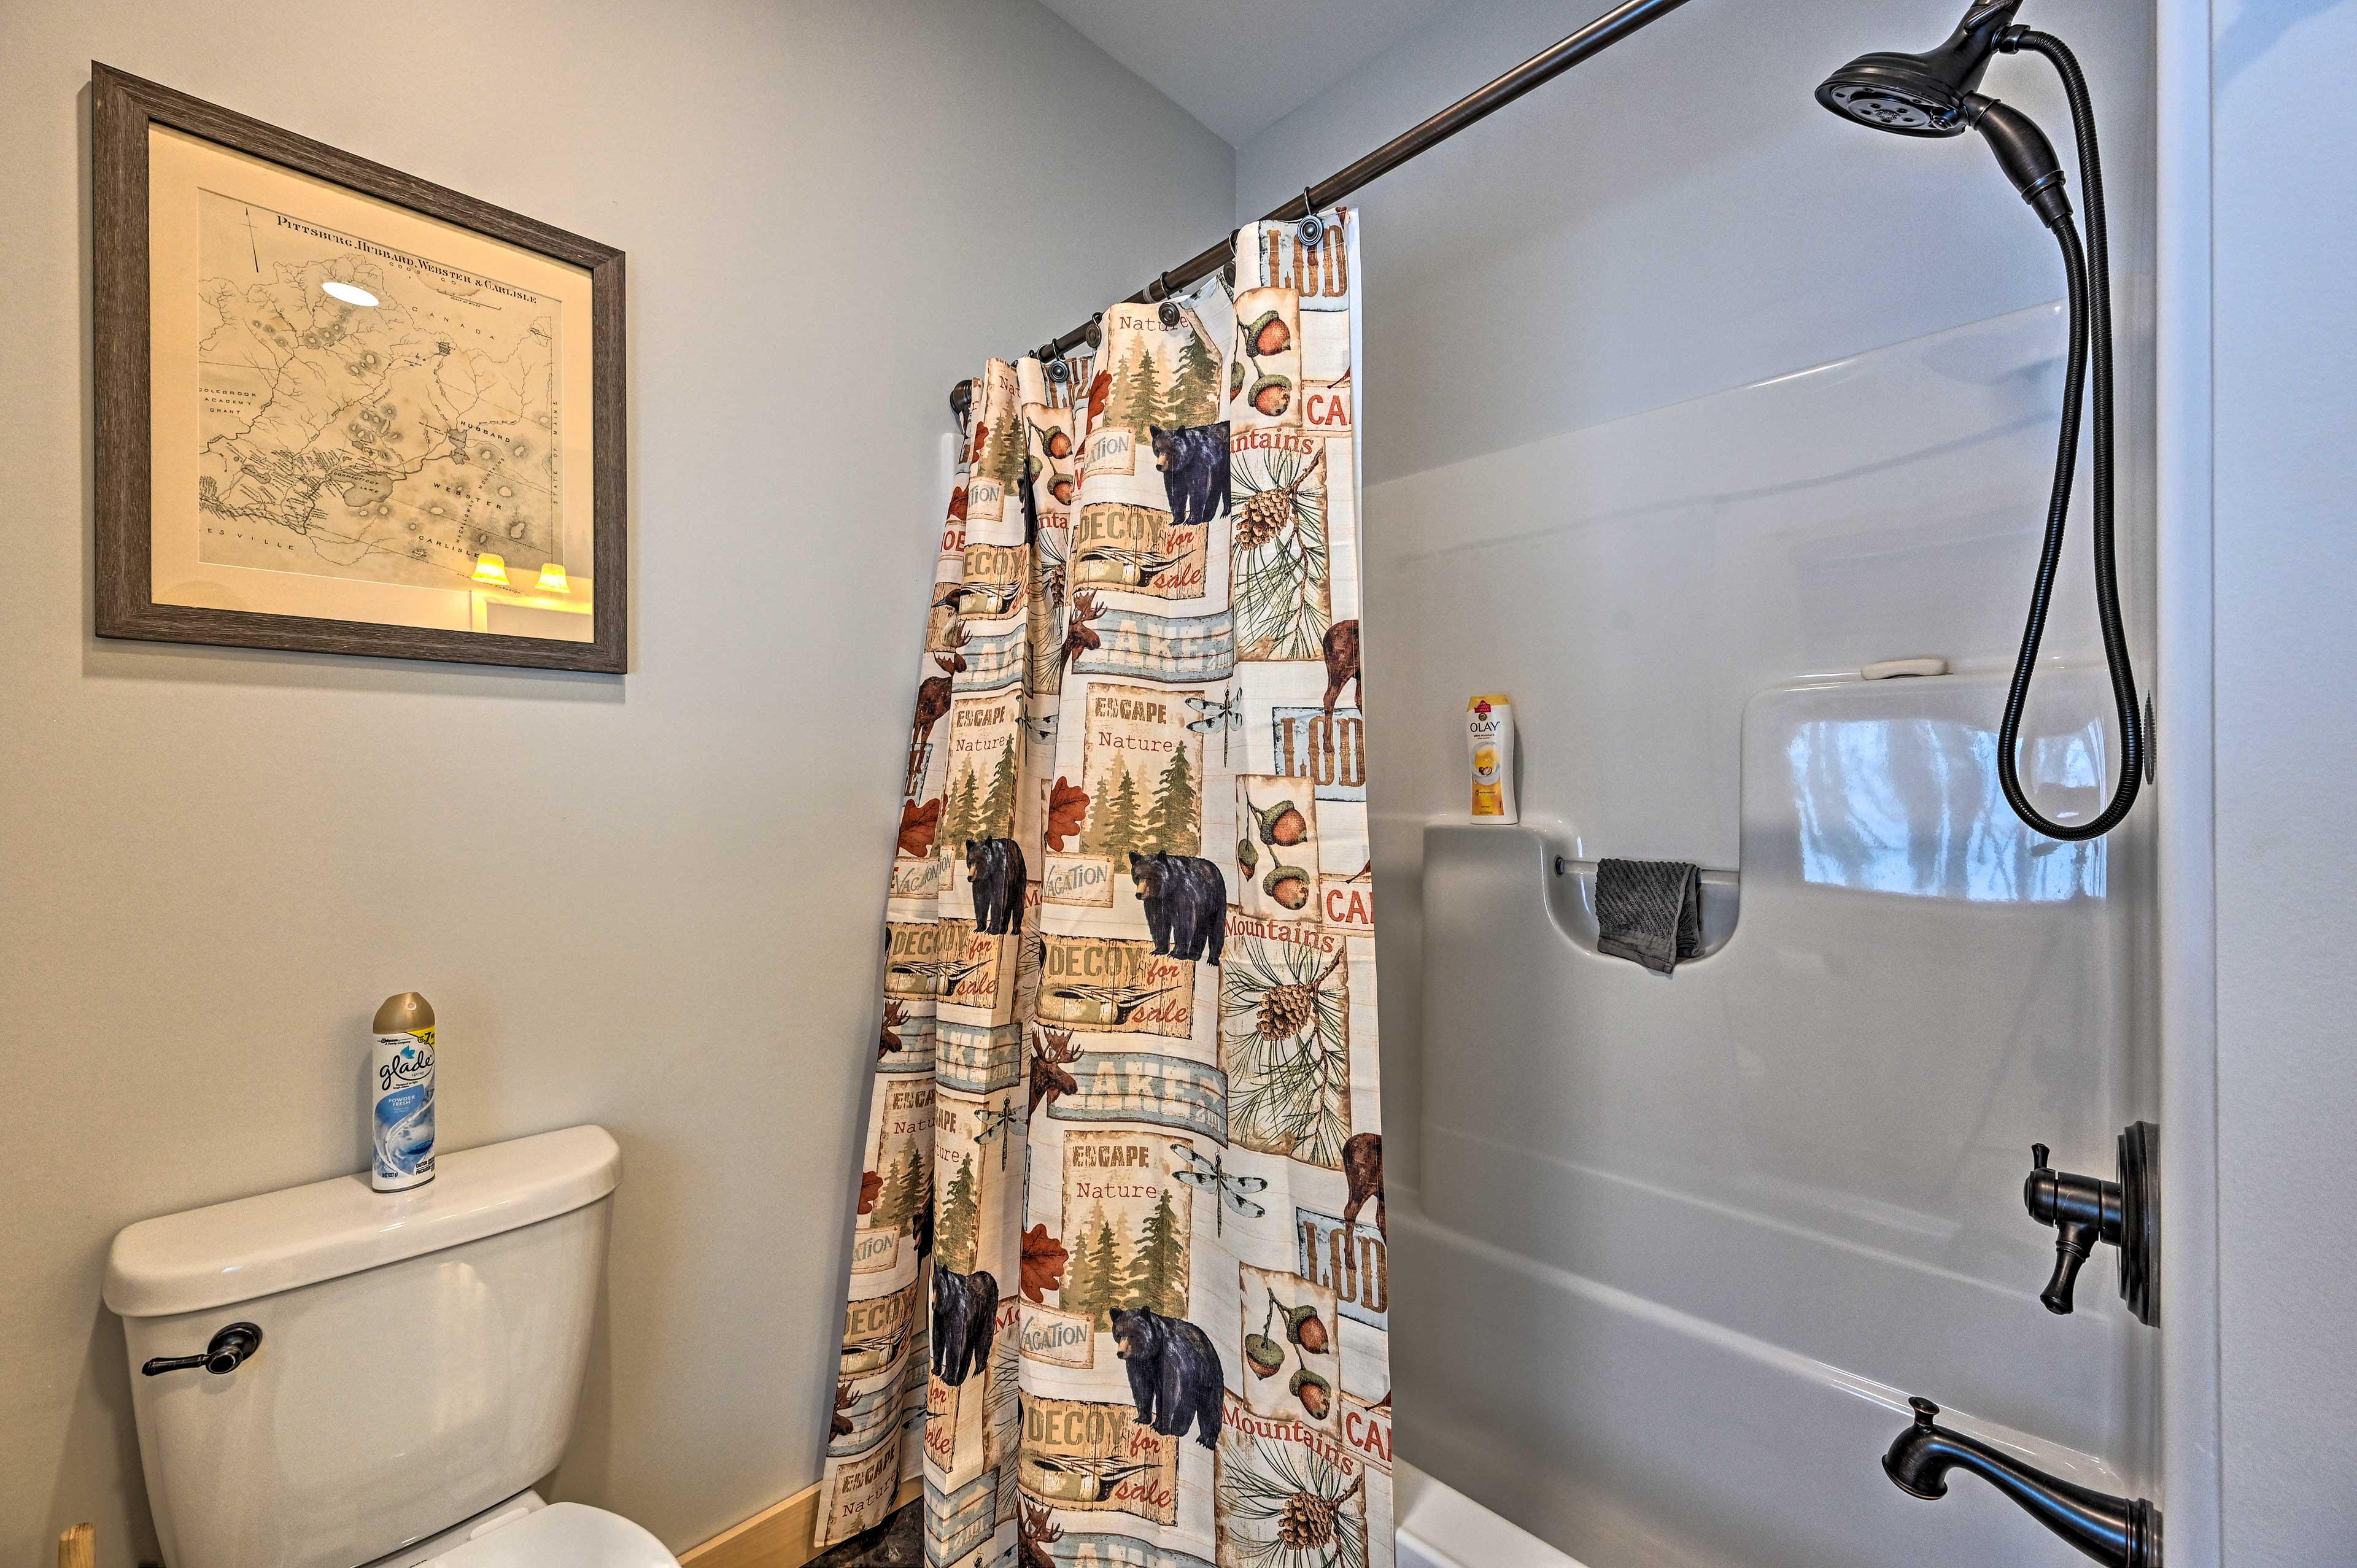 Take a shower or a bath in this full bathroom.